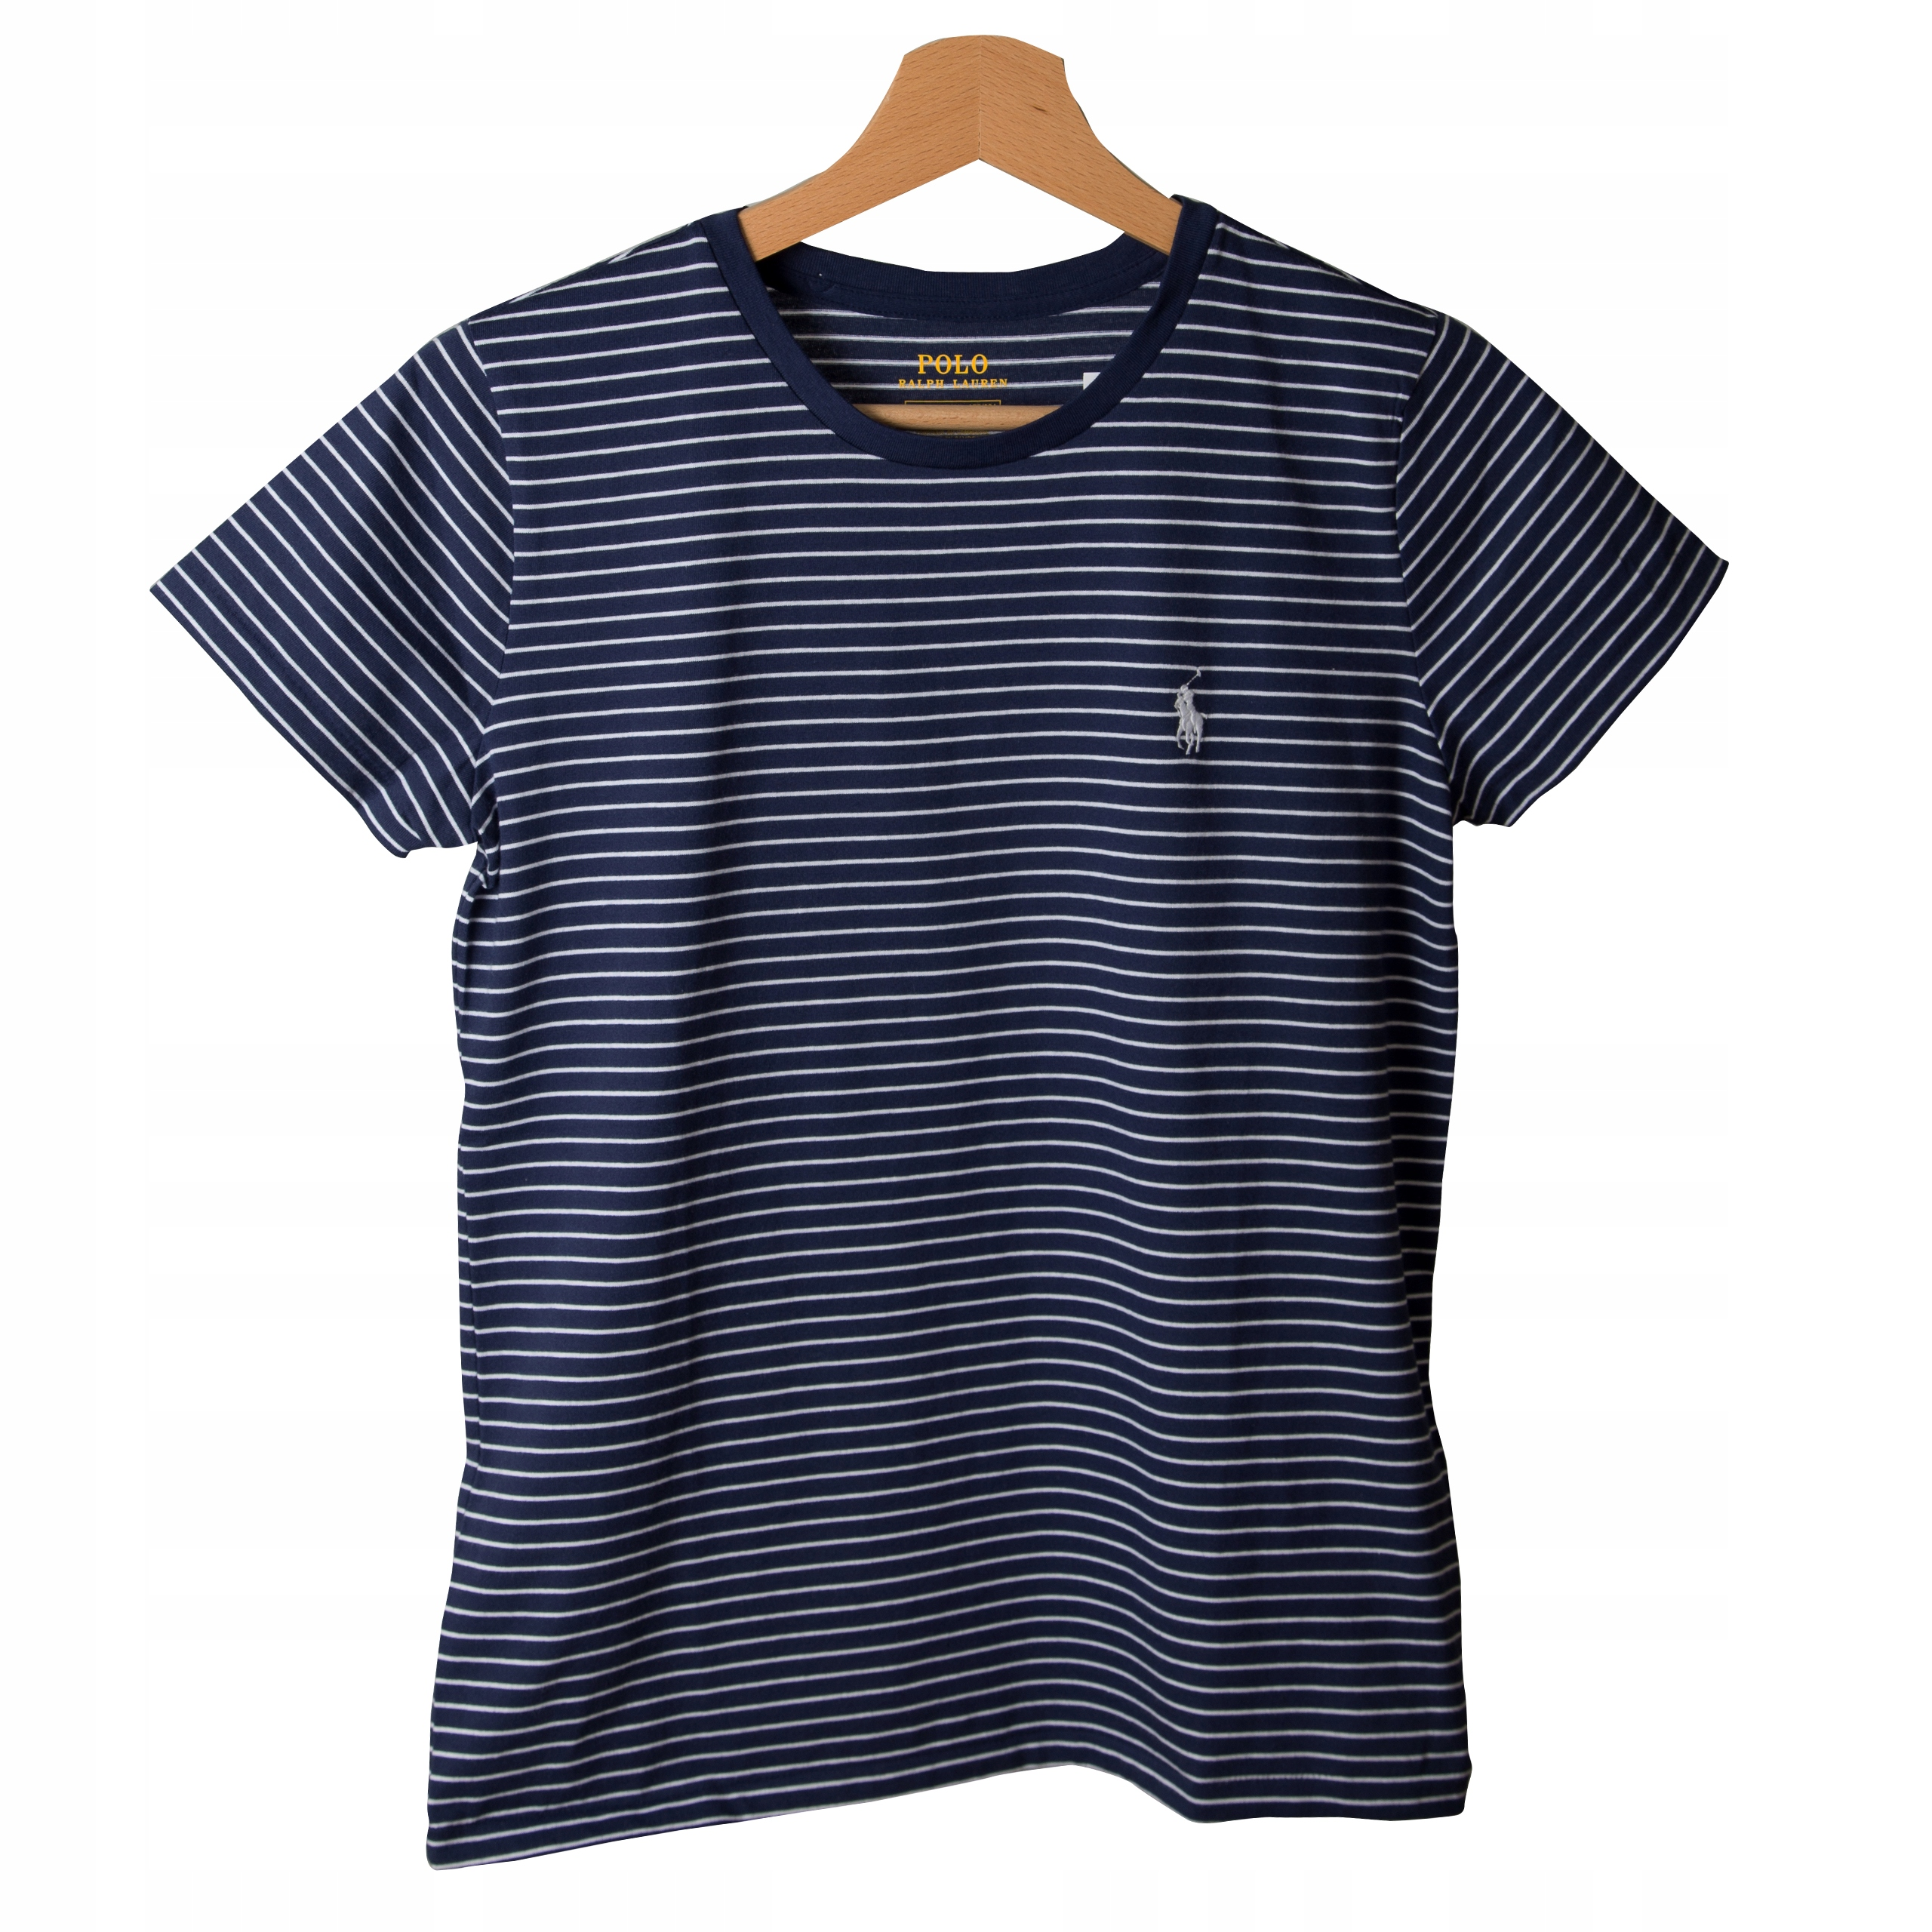 t-shirt Polo Ralph Lauren paski biel granat Xs